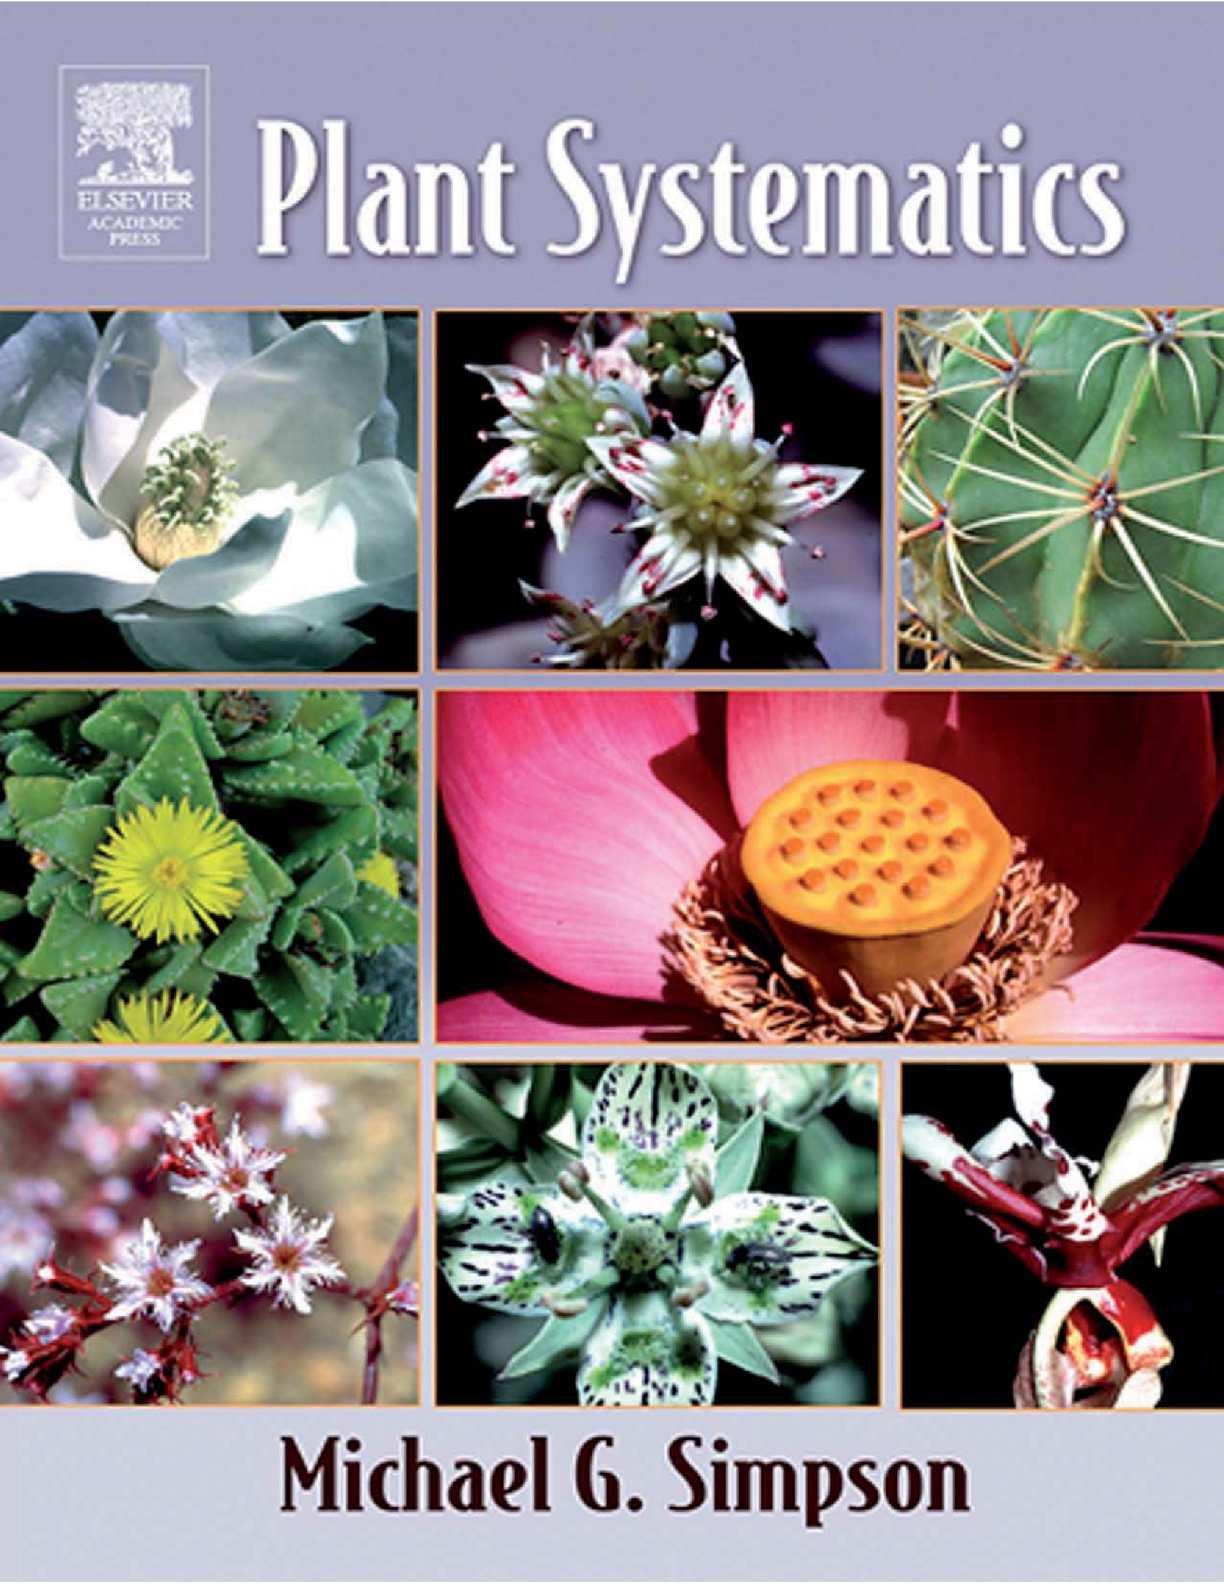 2 Bulbs Lycoris Radiata Spider Lily Flower Adaptable Garden Surface Vegetation